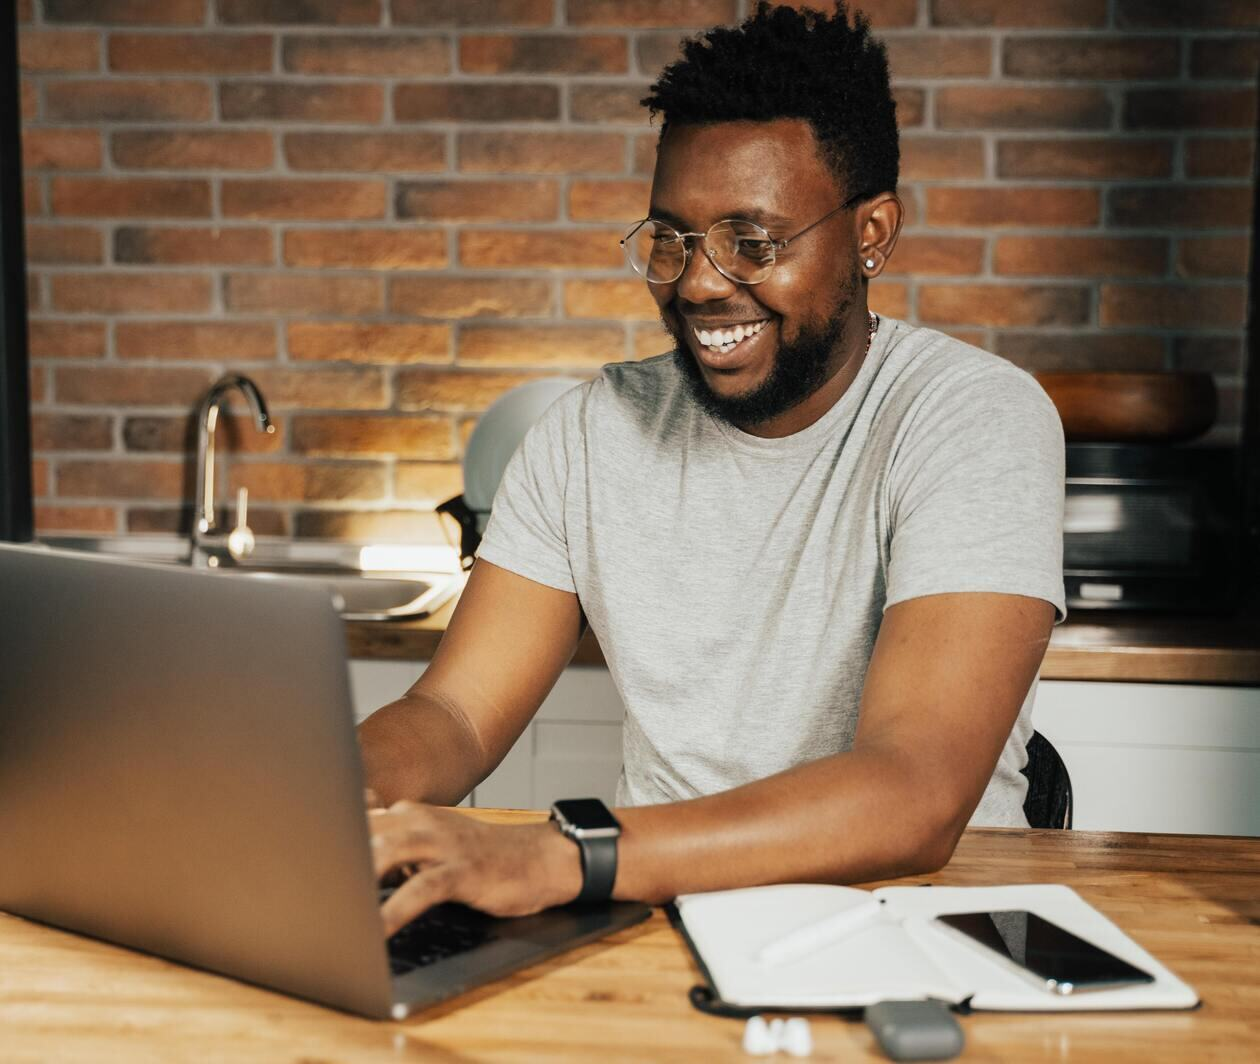 Master Digital Marketing: Introduction to Marketing